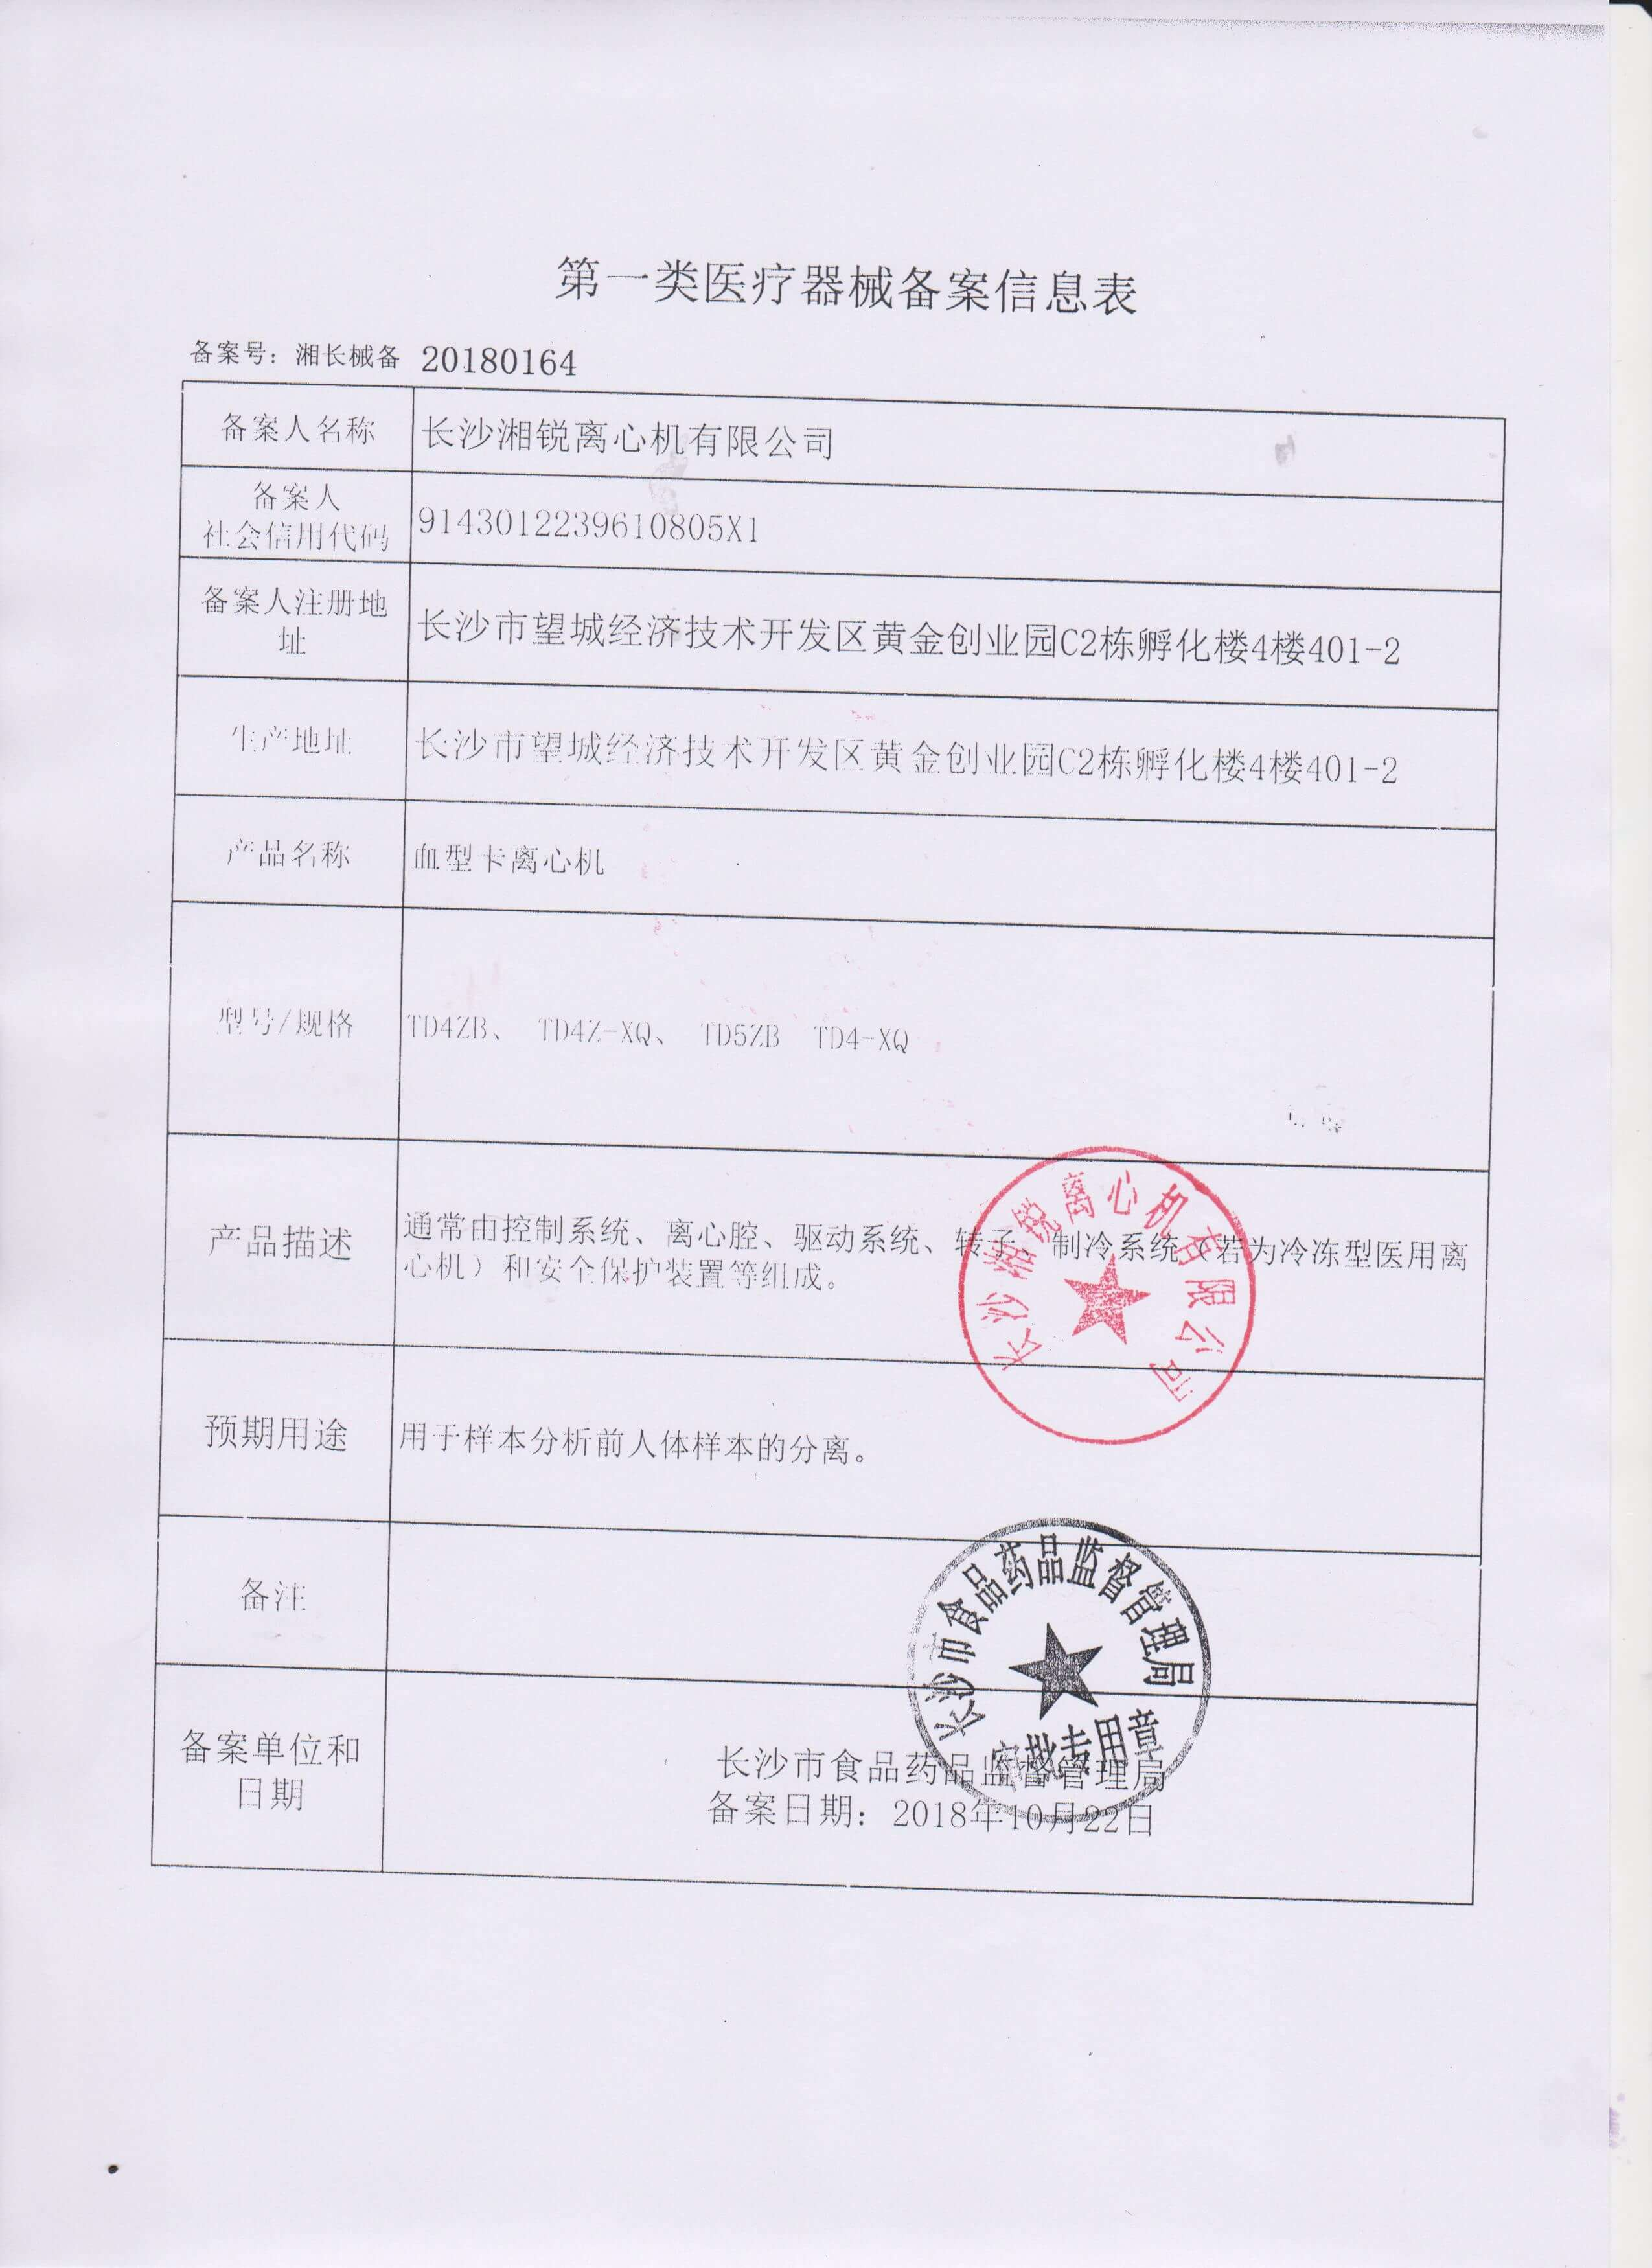 一類醫療器(qi)械dang)赴感畔 0180164